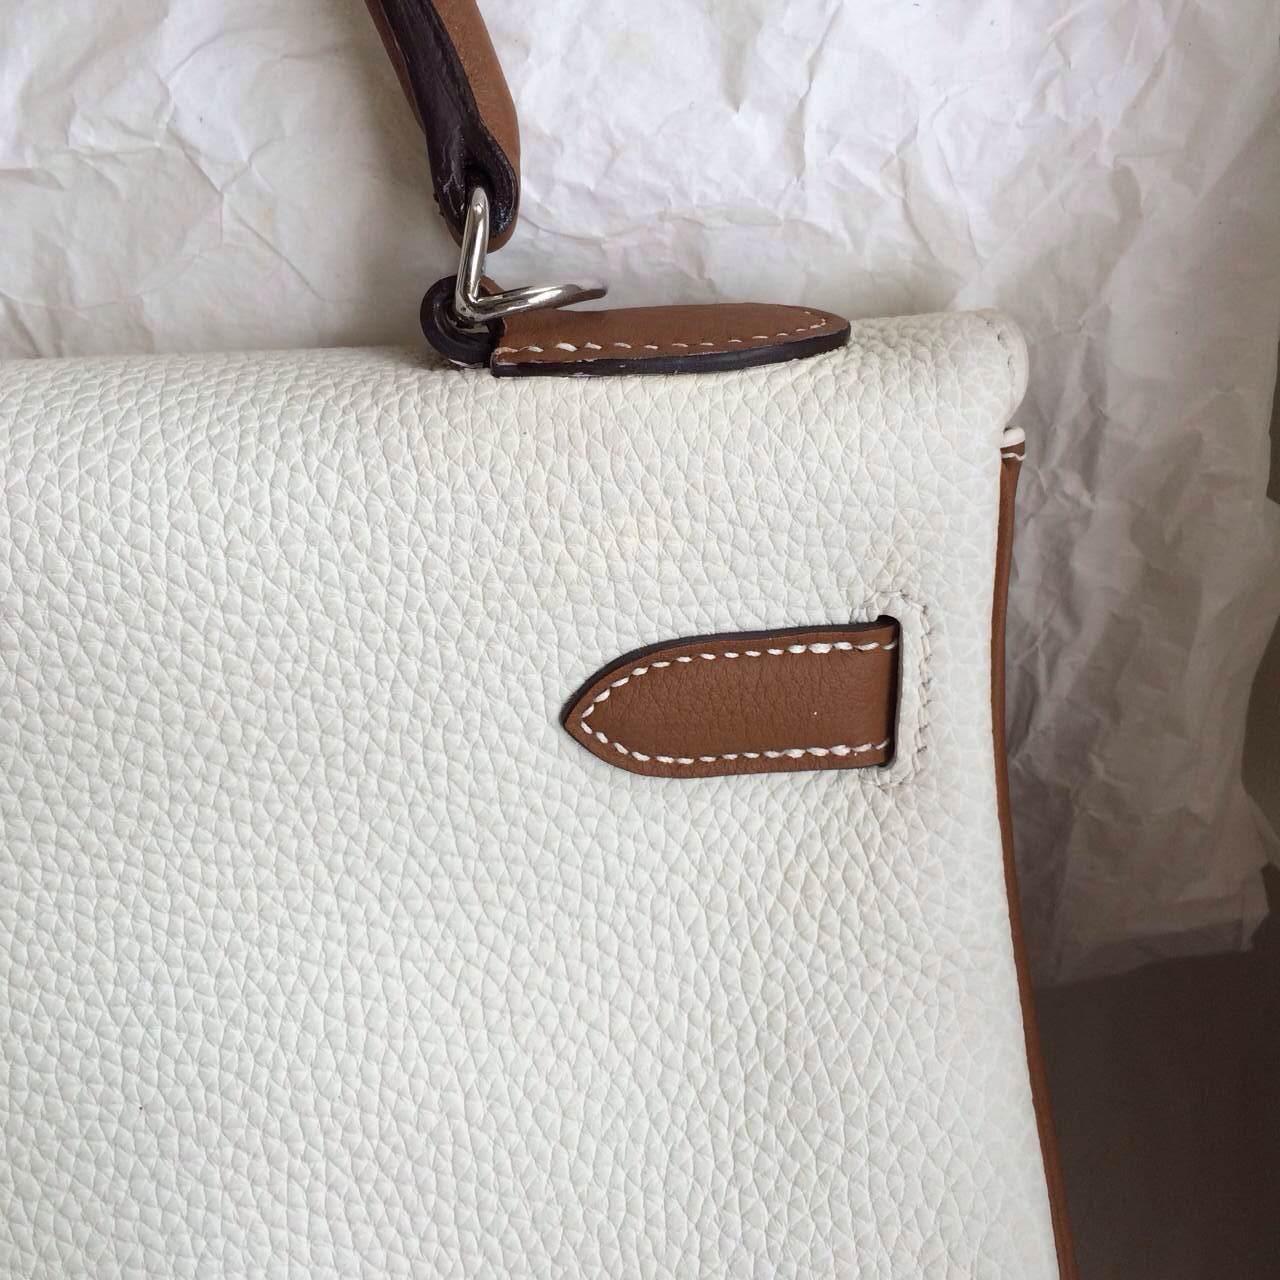 Cheap Hermes Kelly Bag 32cm Retourne in White/Tan Togo Leather Silver Hardware